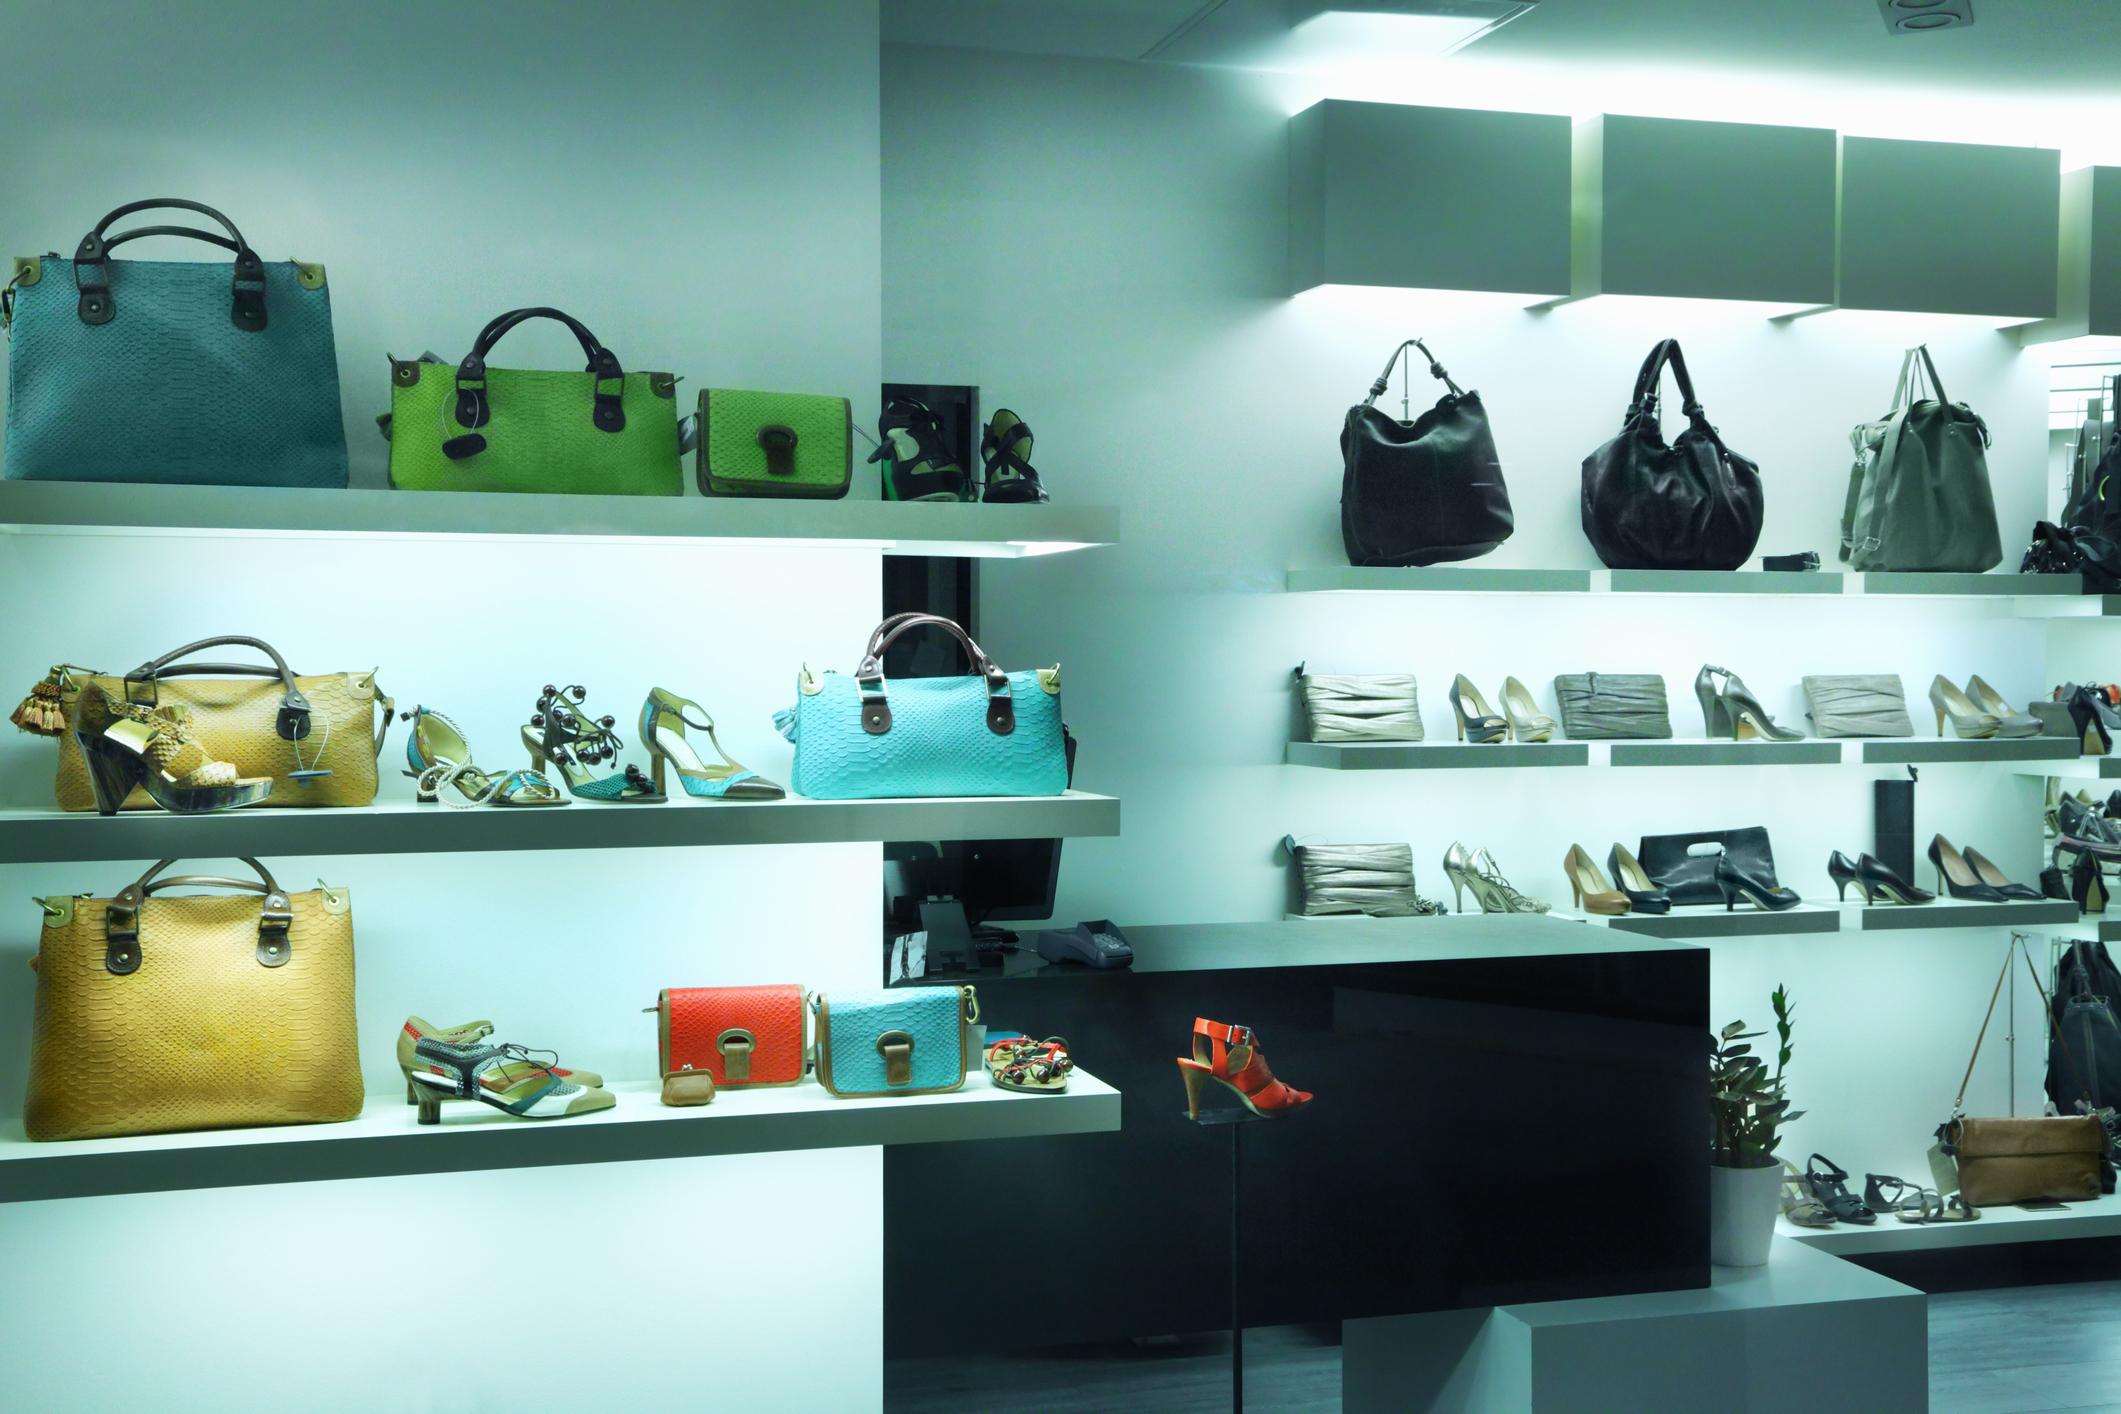 Luxury handbags and accessories.